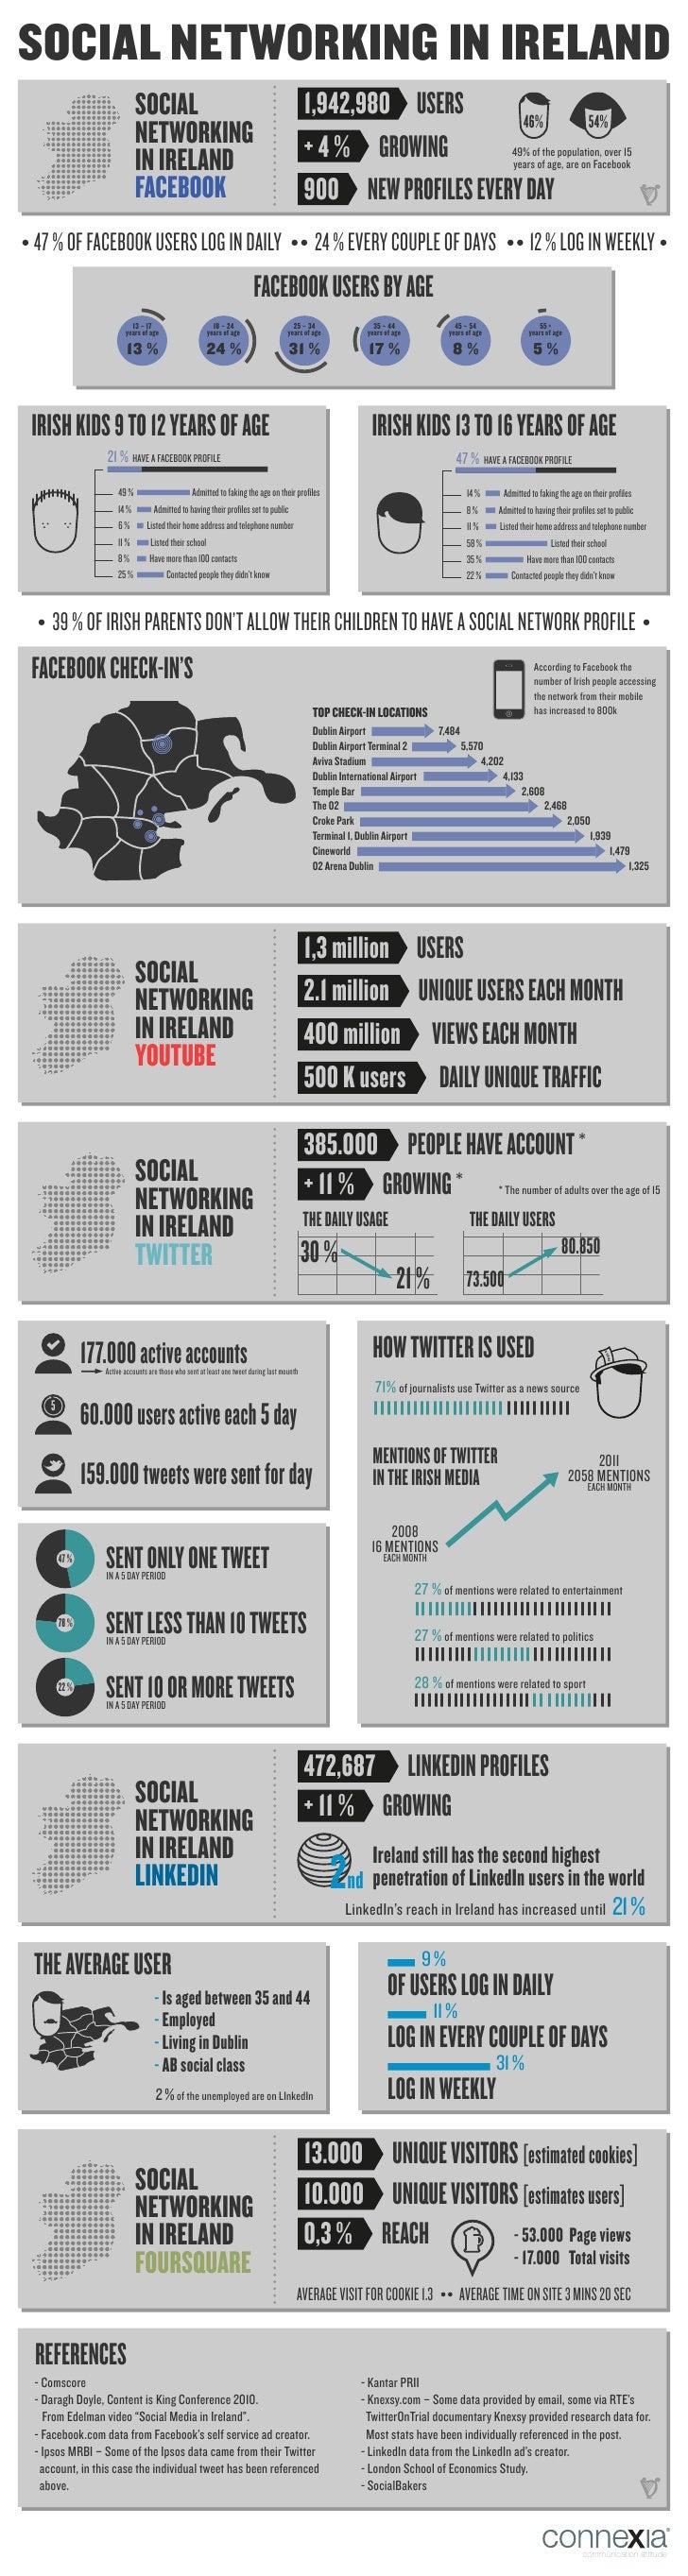 Connexia ireland uk social networking in ireland (1)